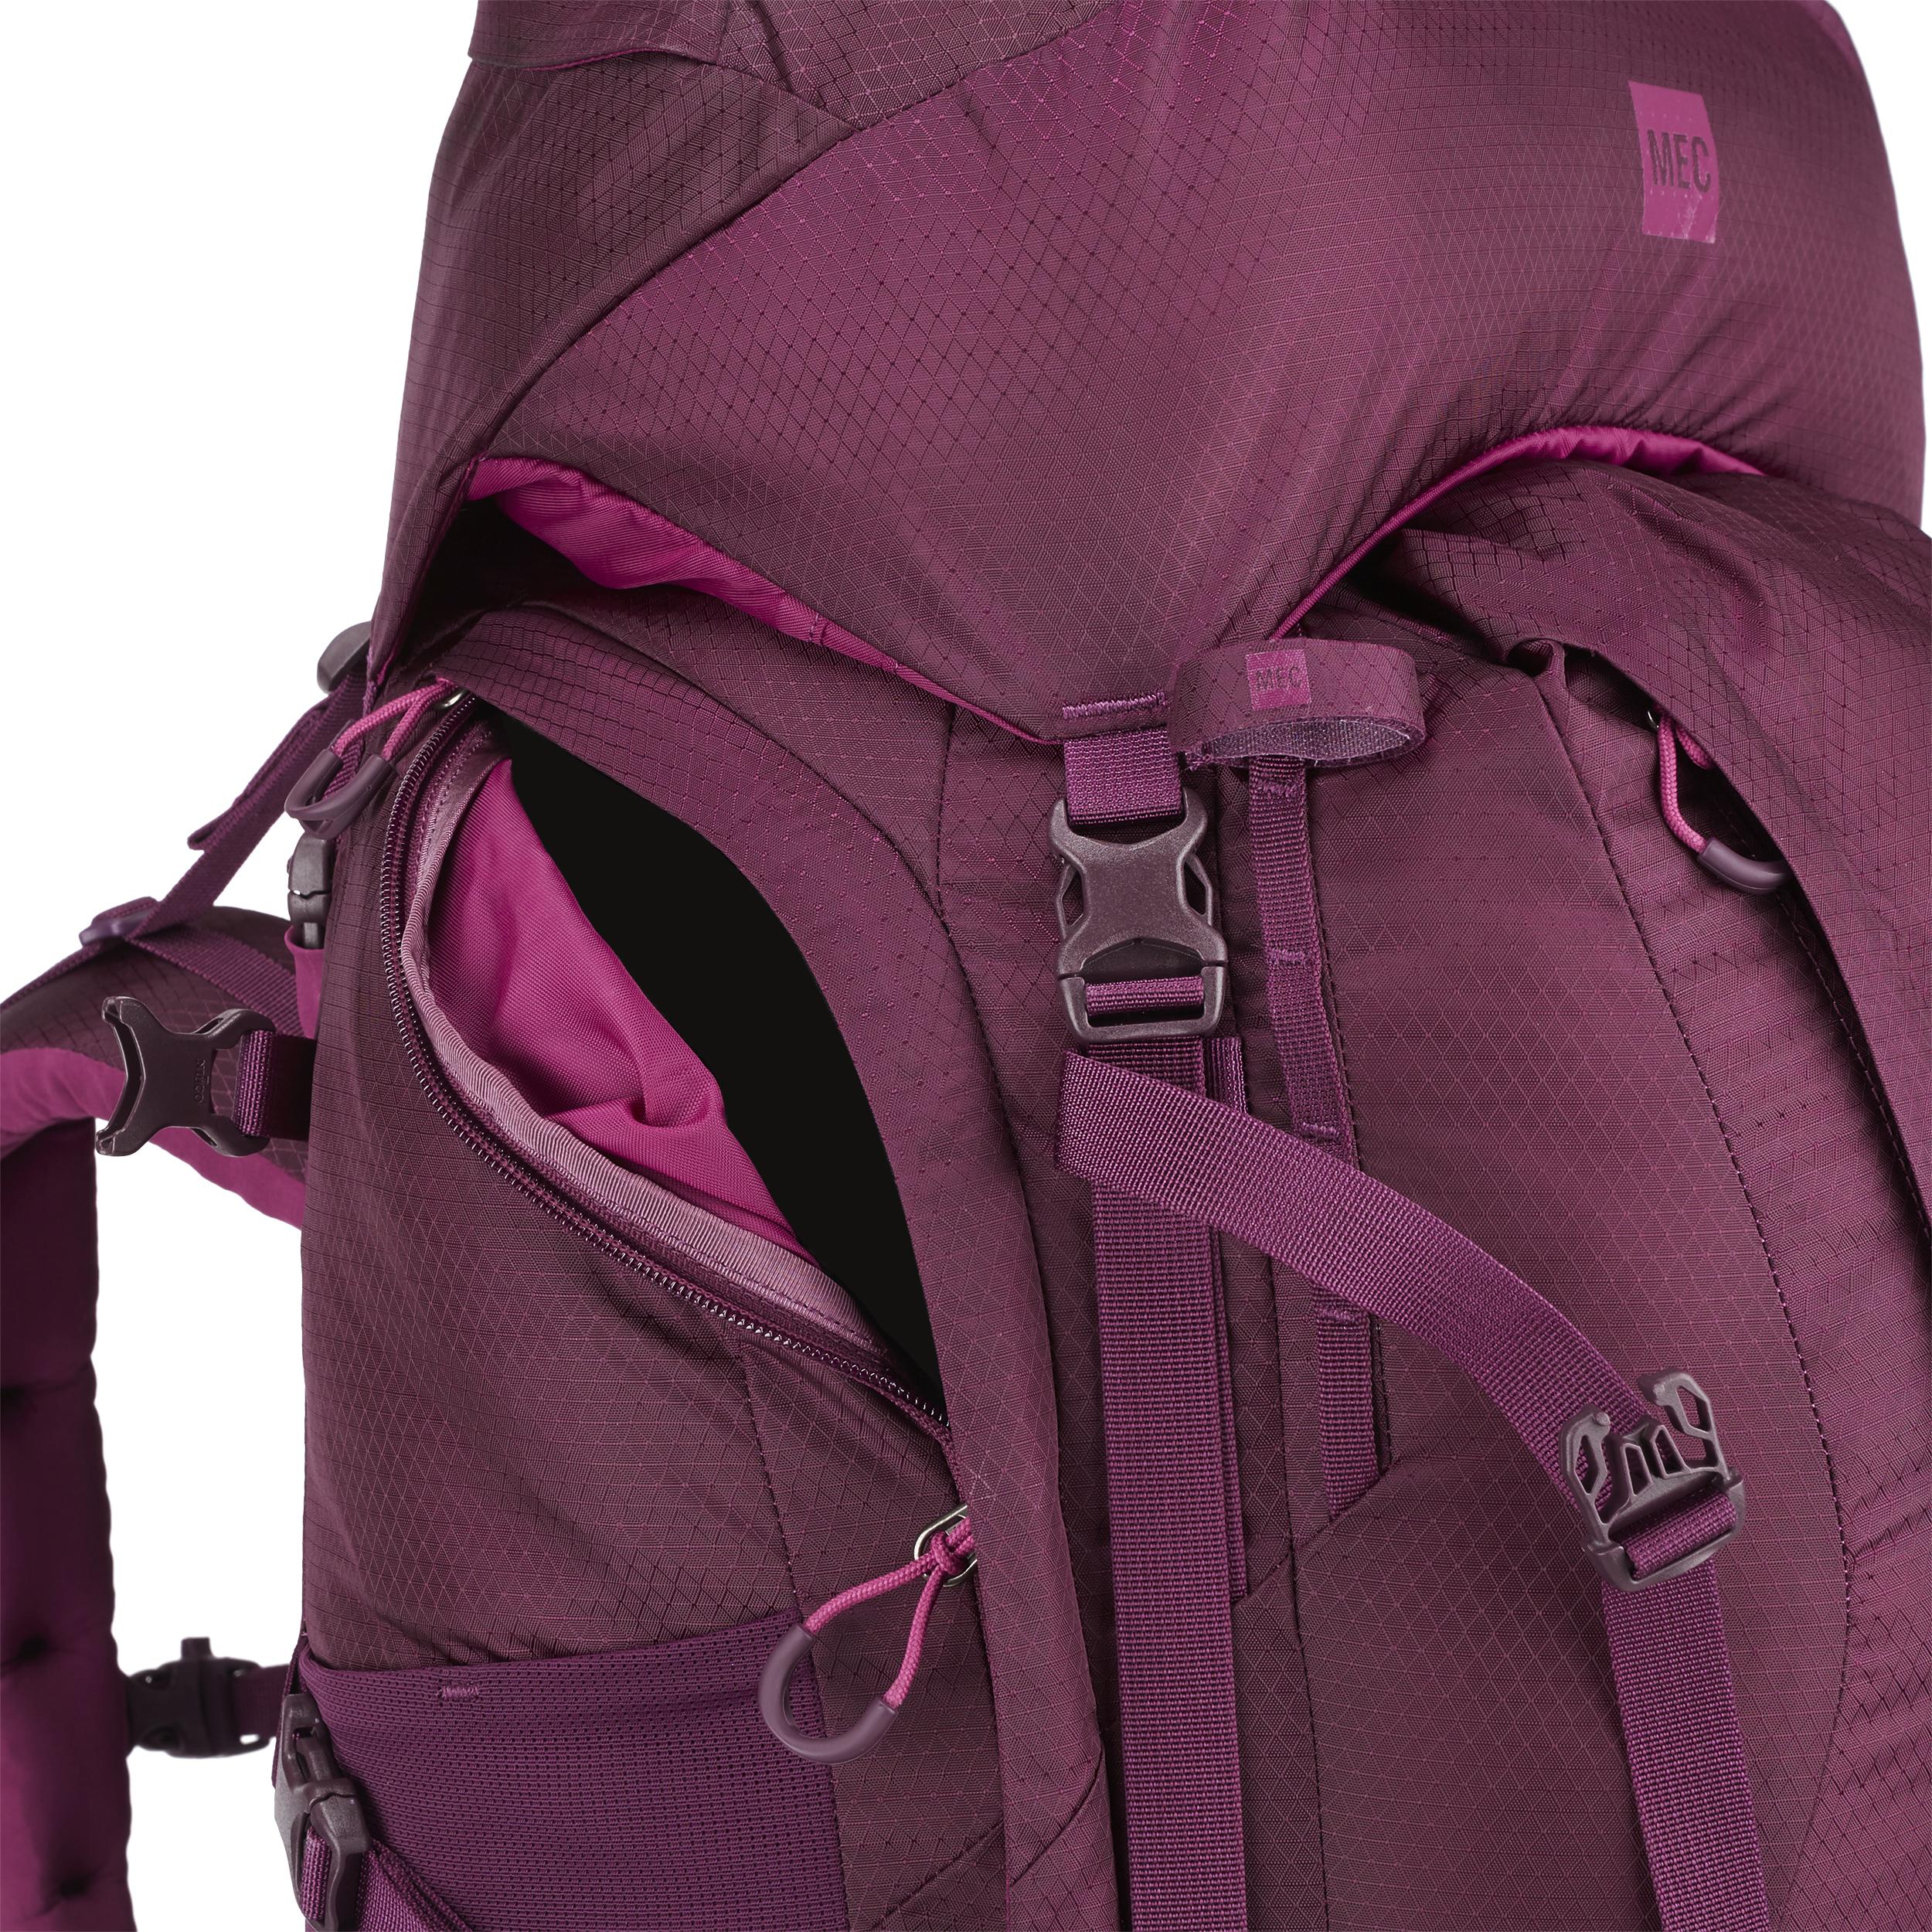 MEC Omega 60 Backpack - Women s 489f5696f5b4c